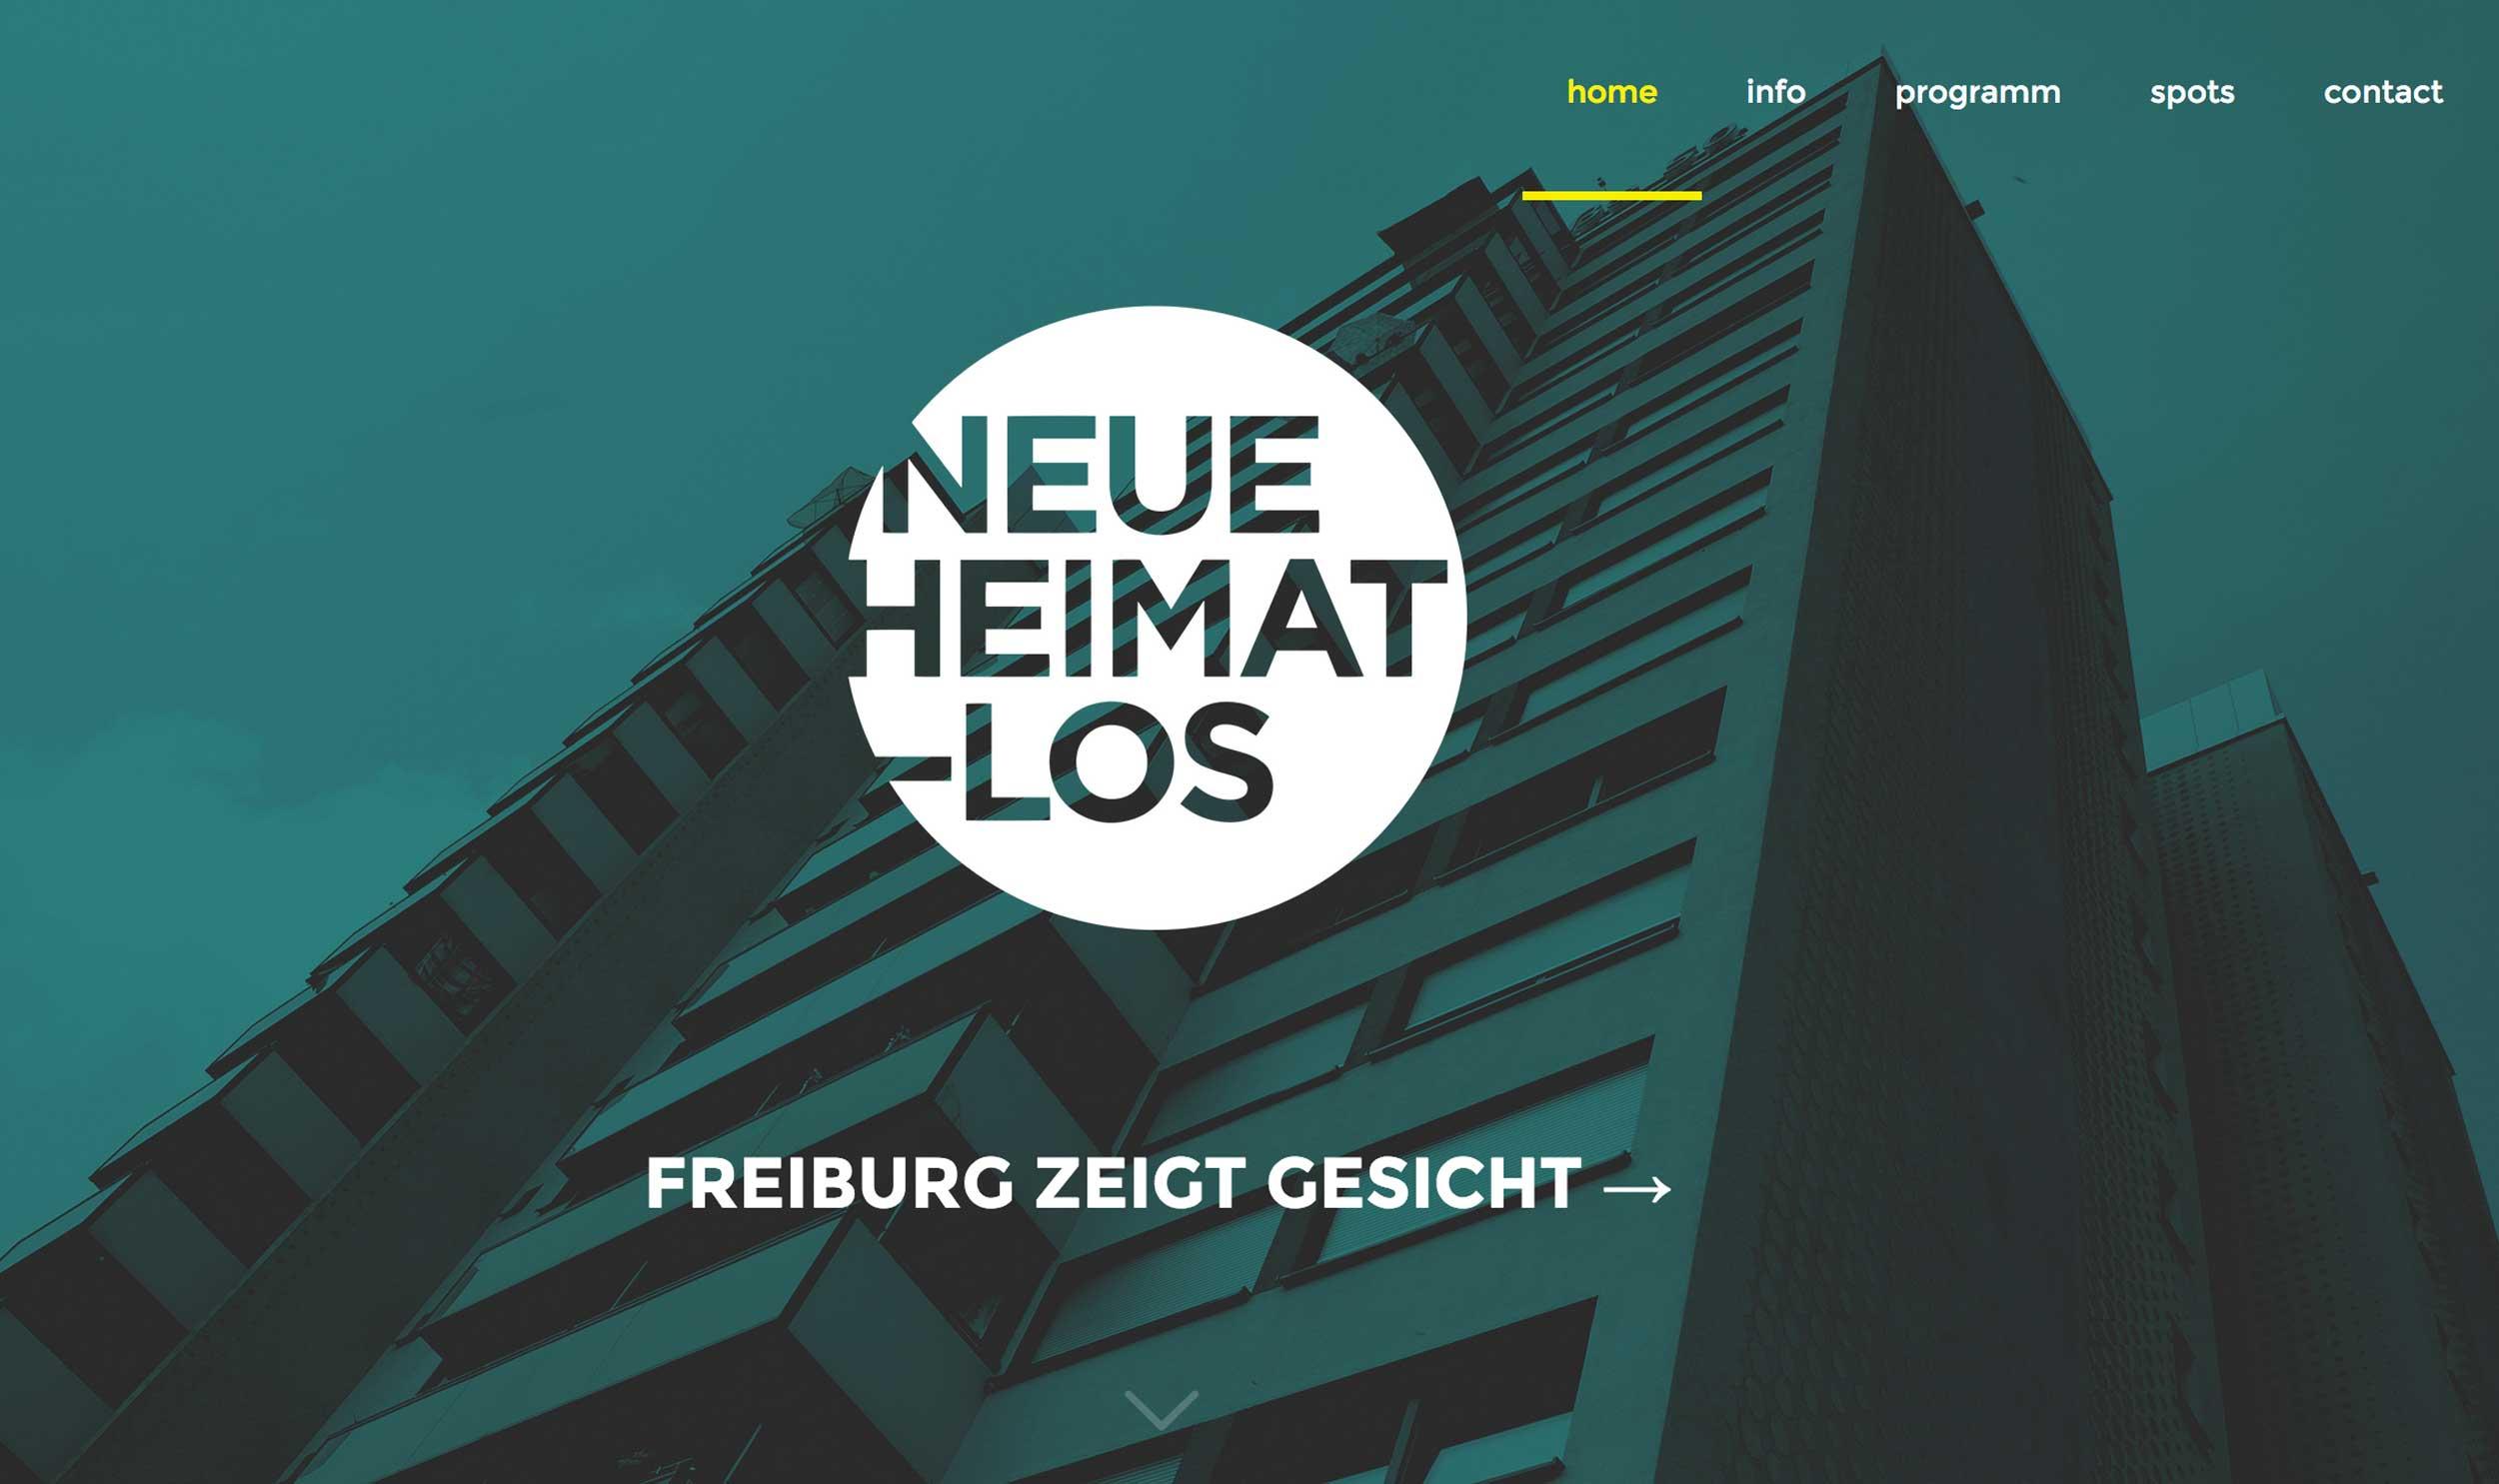 Blog_Neue_Heimat_los_02